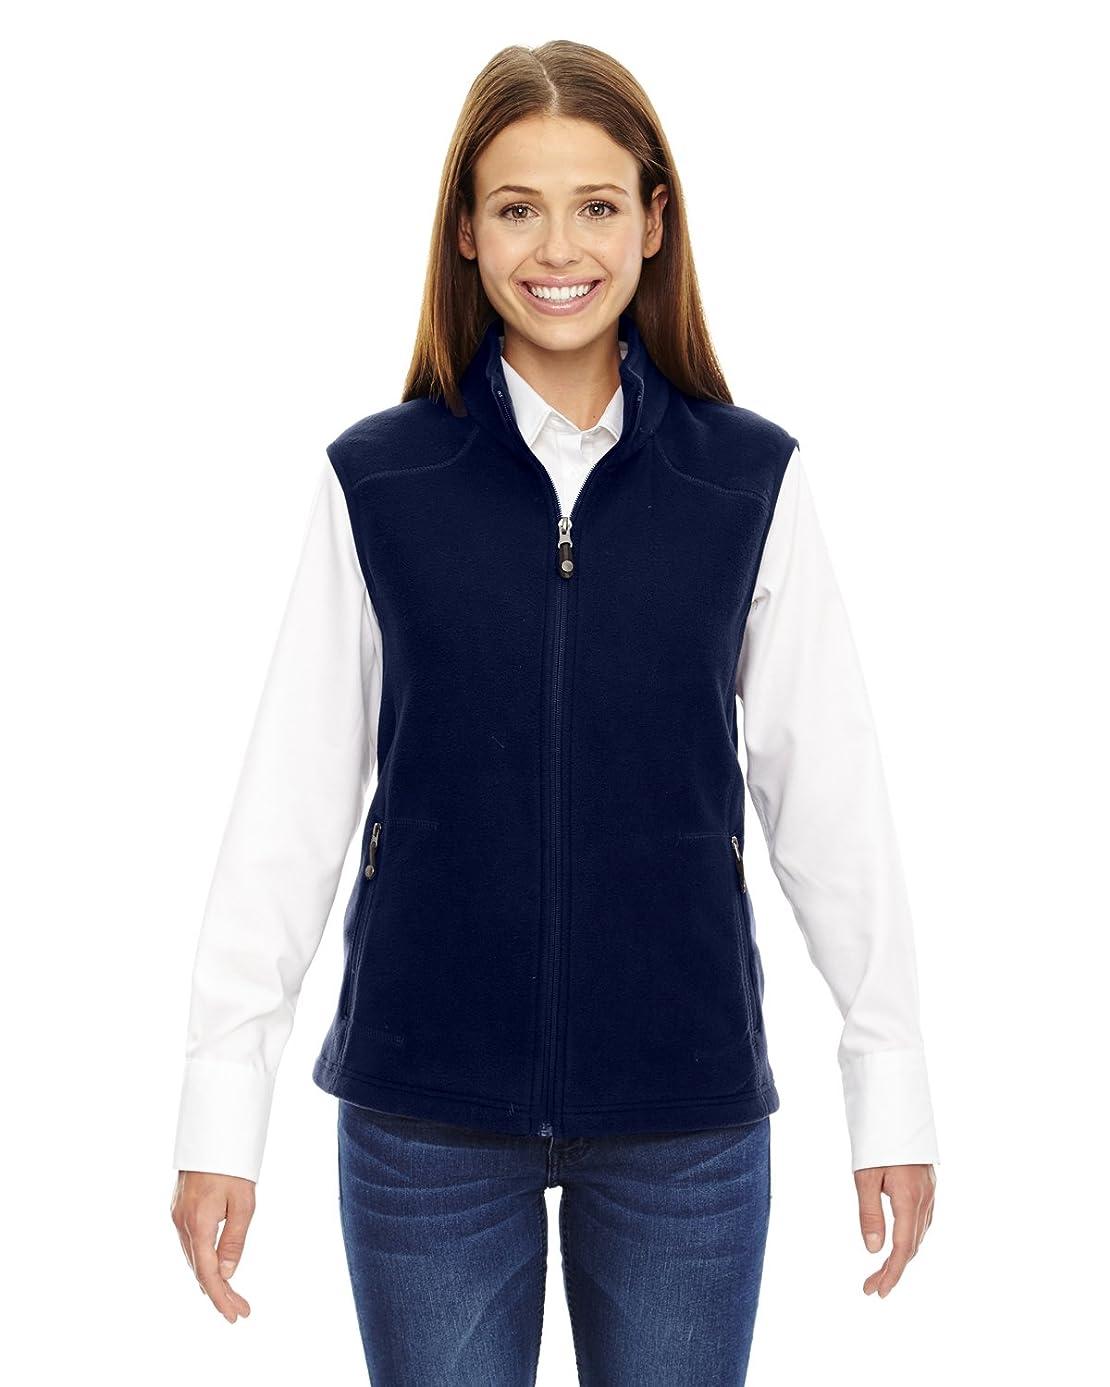 North End Womens Voyage Fleece Vest (78173) -CLASSIC NAVY -S